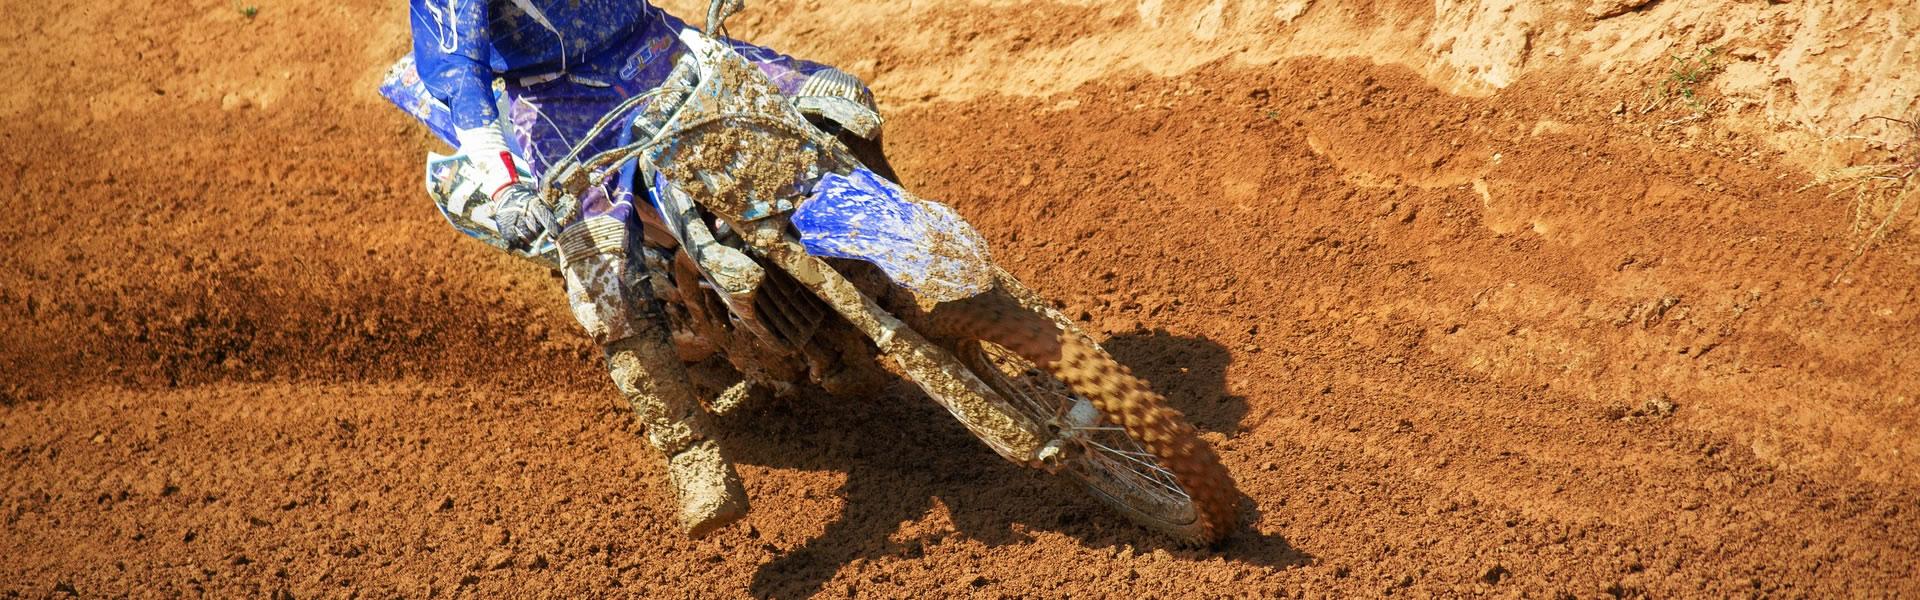 Deporte Motocross